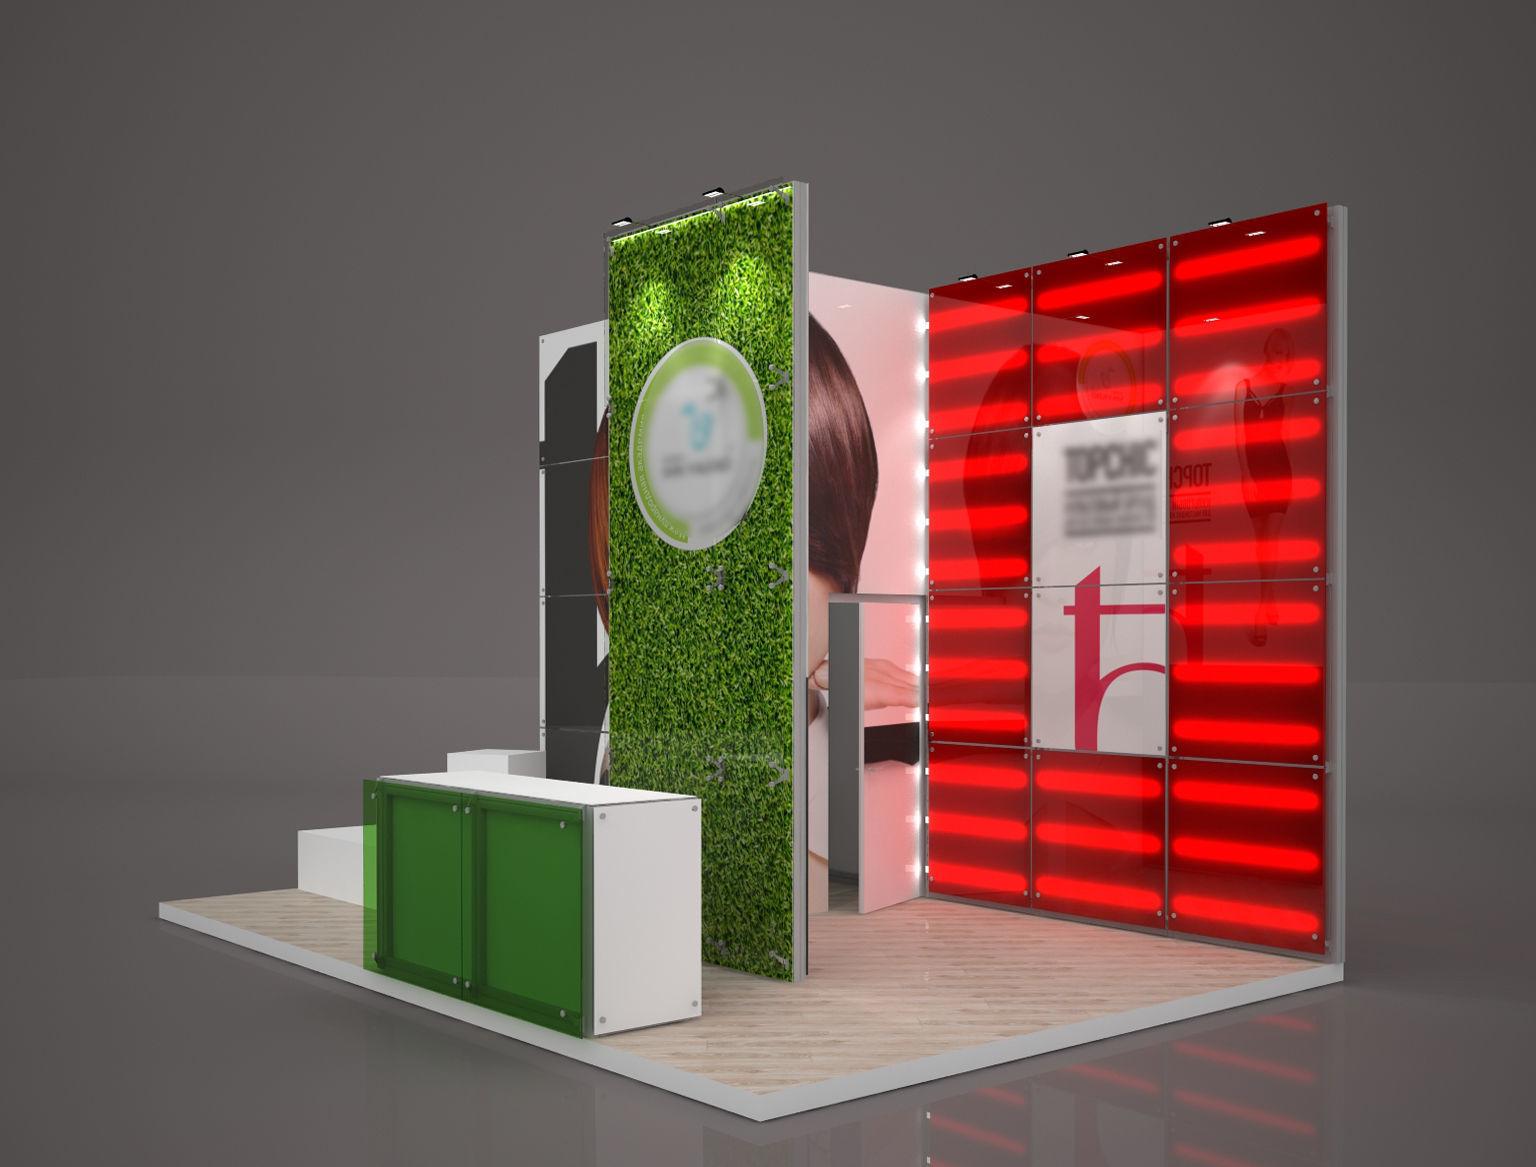 Exhibition stand octanorm maxima 6x4 m